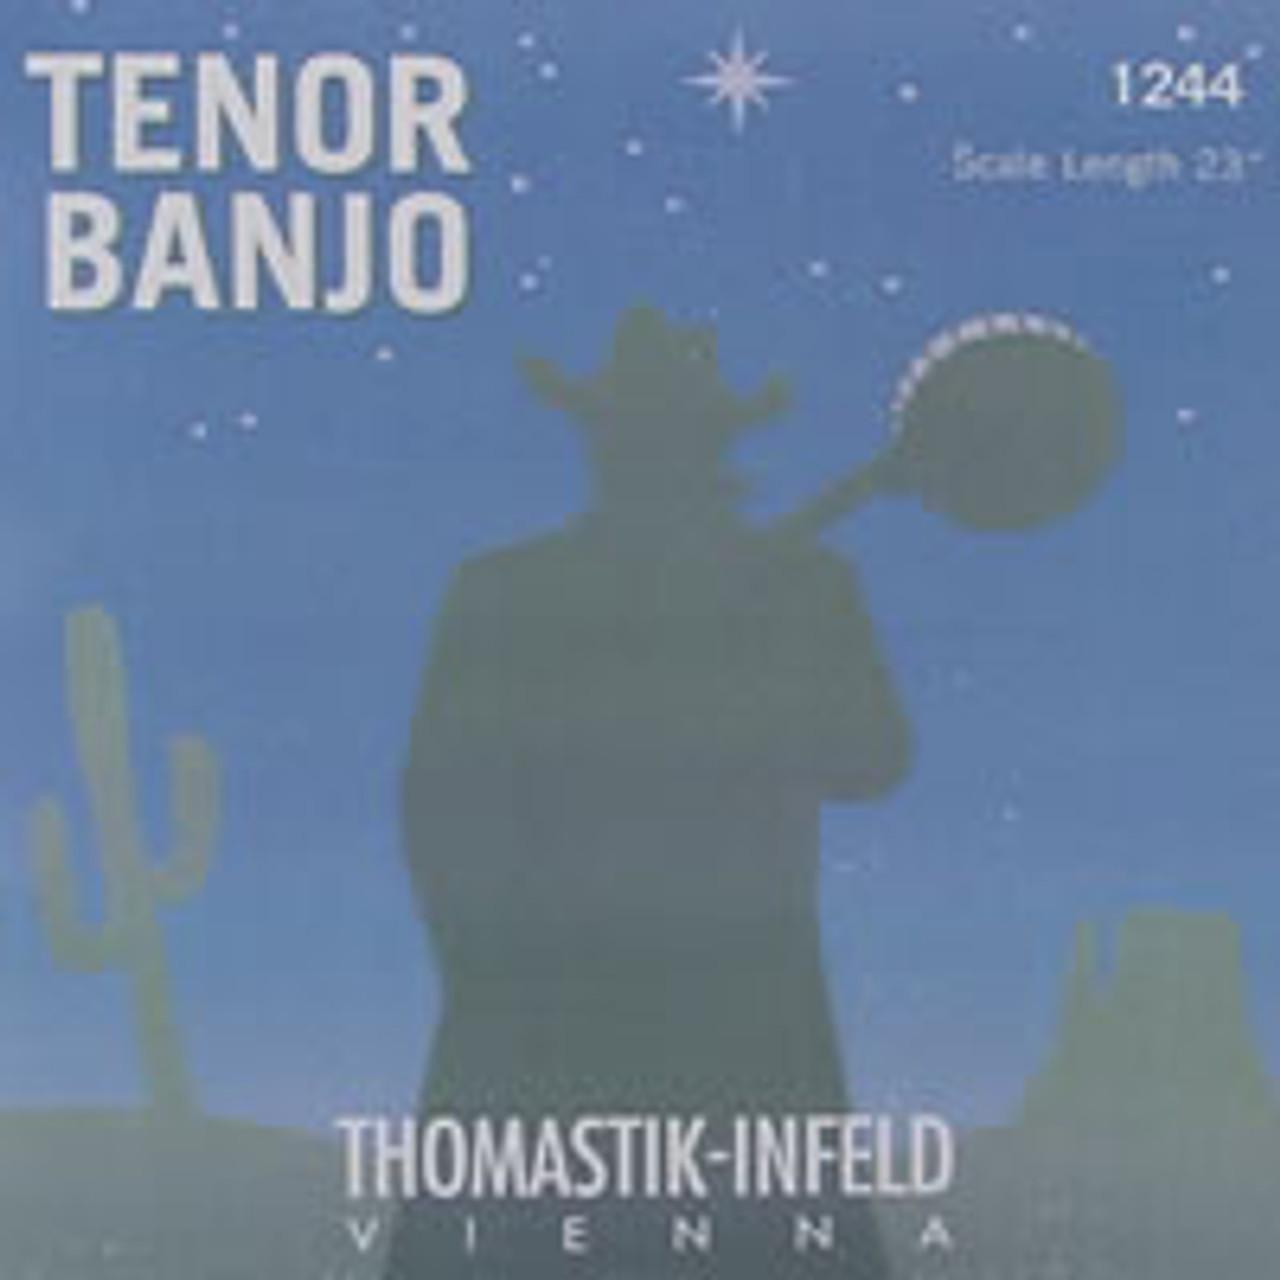 Thomastik 1244 Tenor Banjo Strings (10-31)